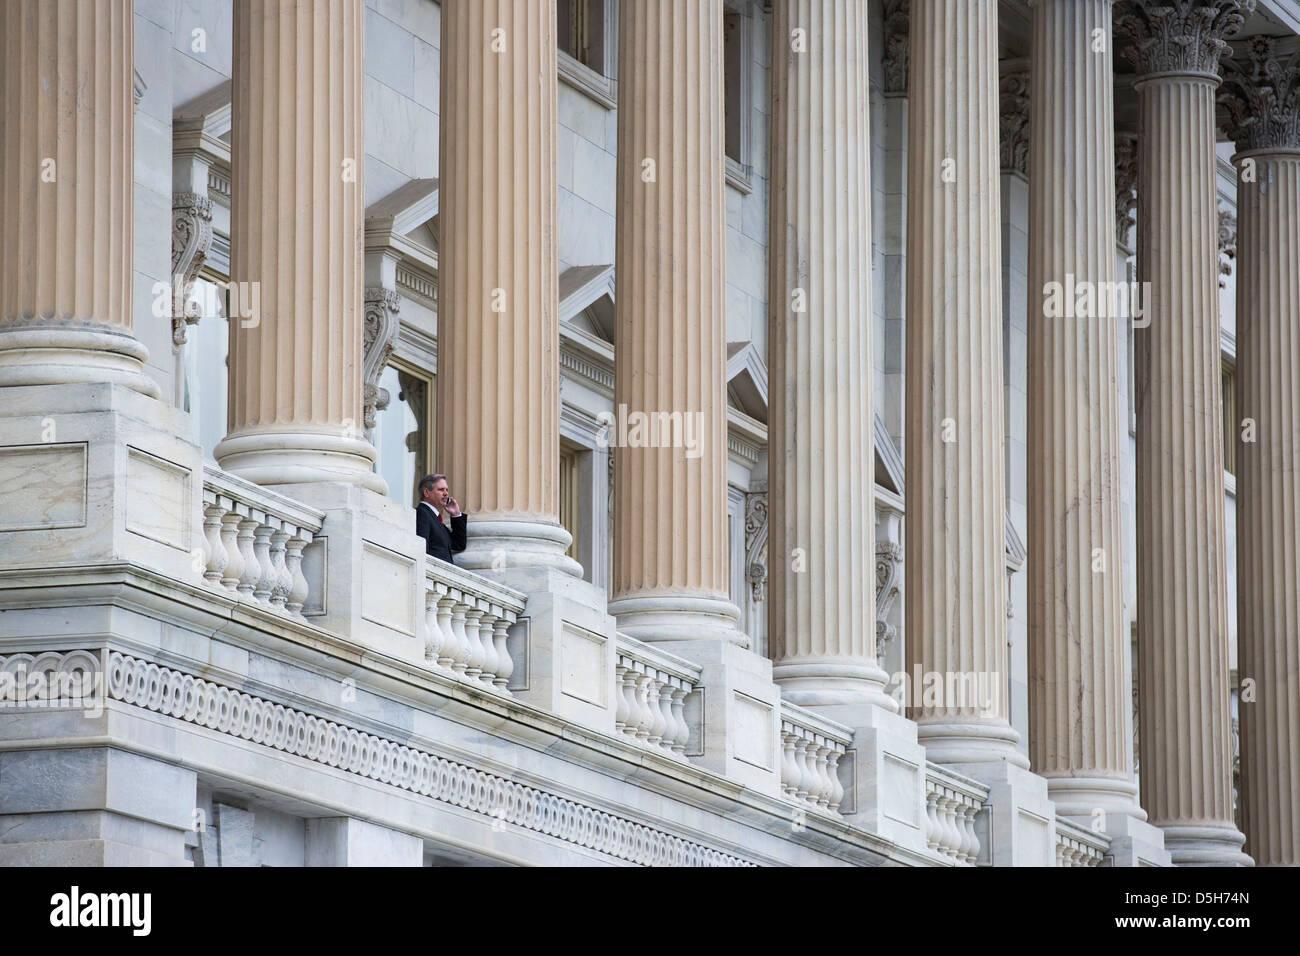 Senator John Hoeven (R-ND) speaks on a mobile phone the Senate Balcony at the U.S. Capitol in Washington on December - Stock Image